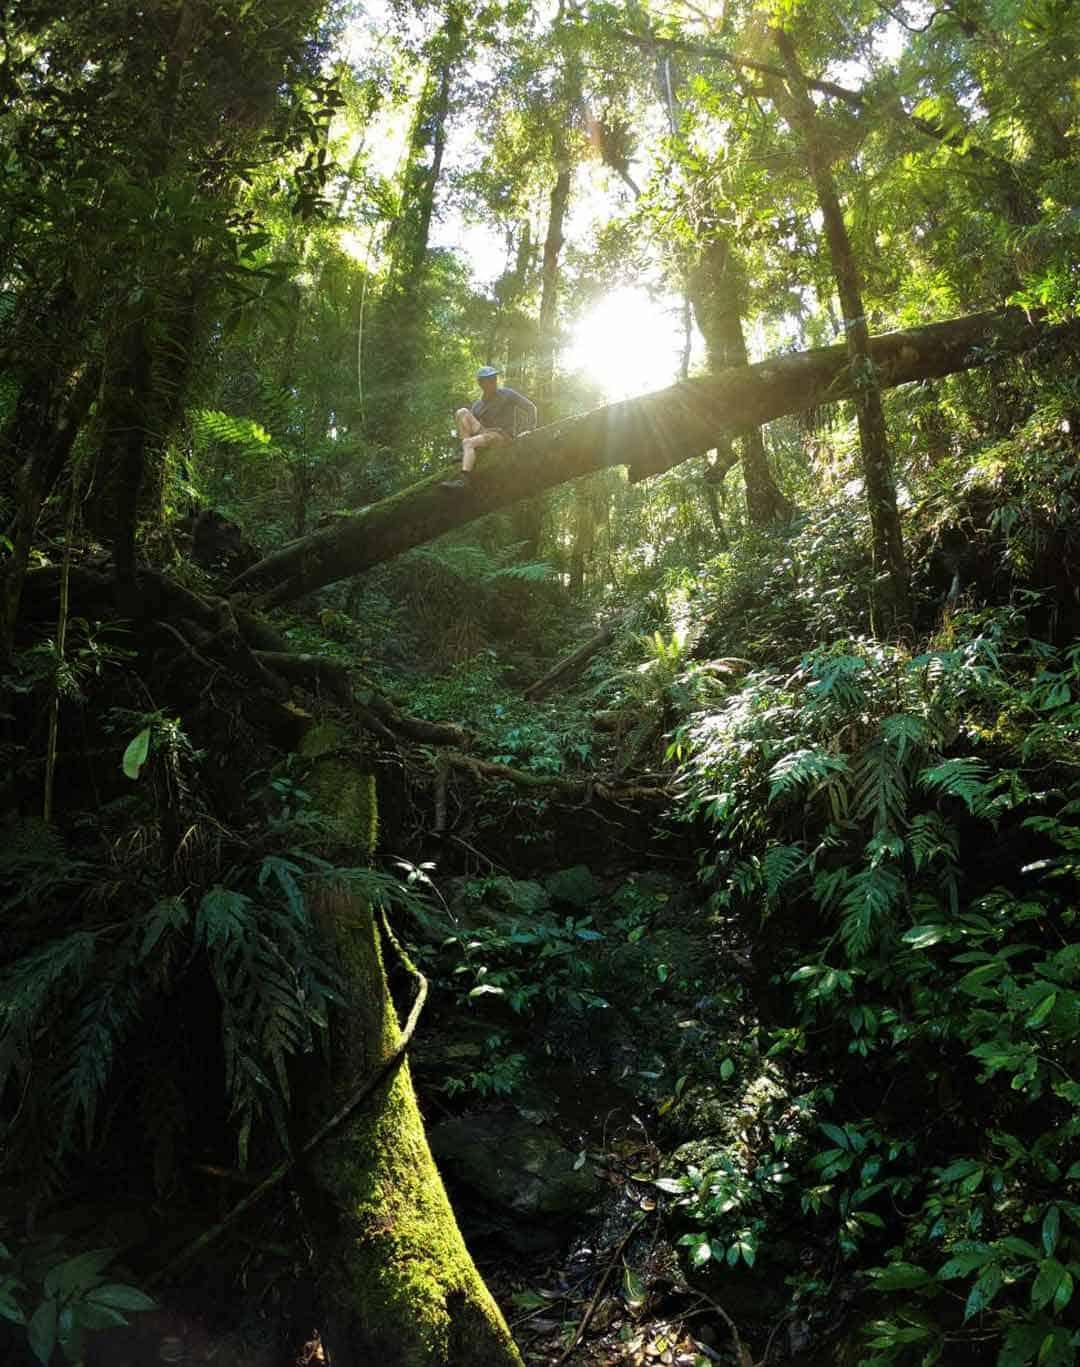 Adventure Camera Gopro Hero 7 Review